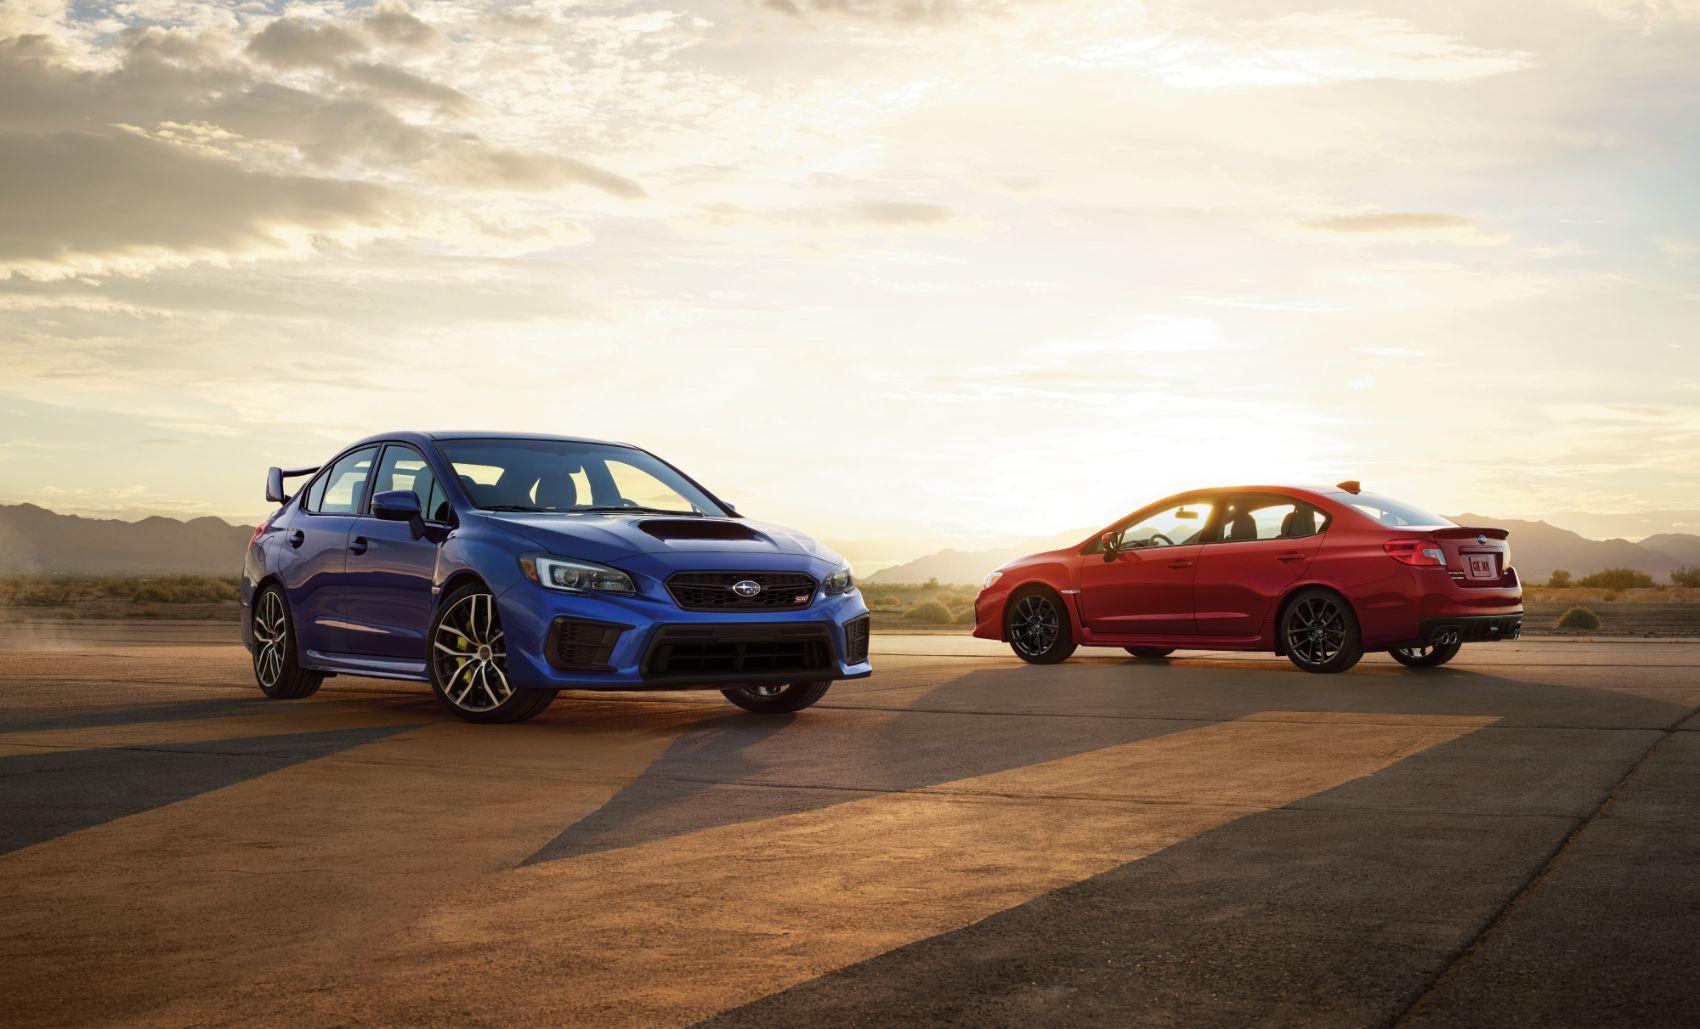 2021 Subaru WRX 6